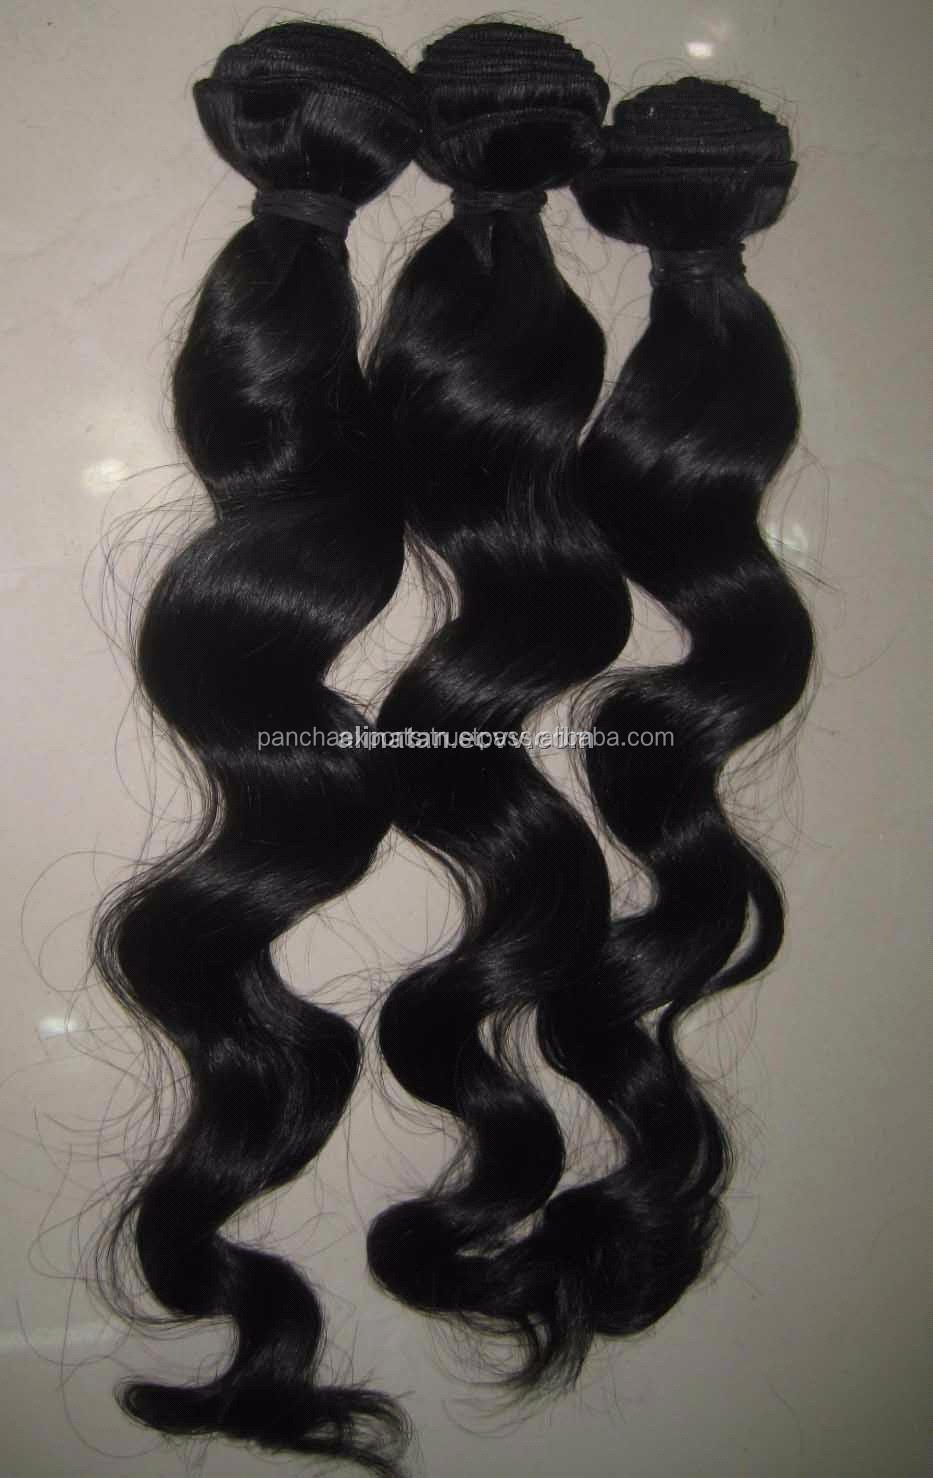 China_virgin_hair_weft_hair_weaving_human_hair_hair_weave_virgin_human_hair_hair_extensions2012717639210.jpg